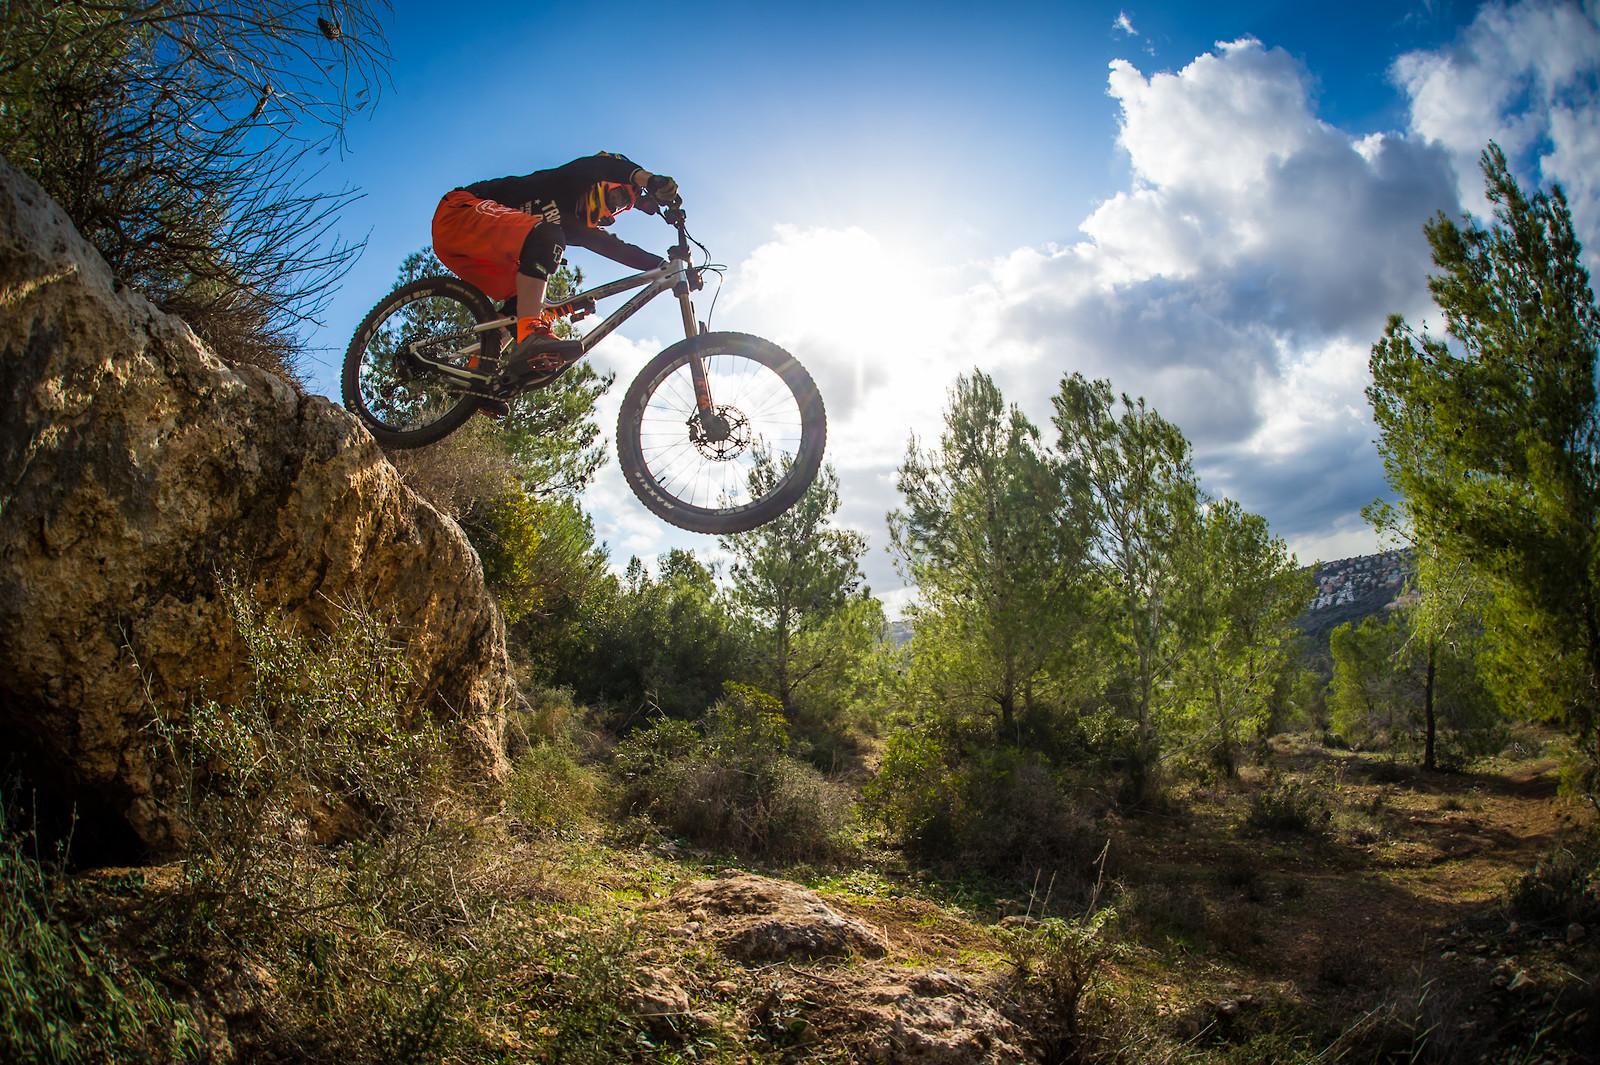 Dropping In - iceman2058 - Mountain Biking Pictures - Vital MTB